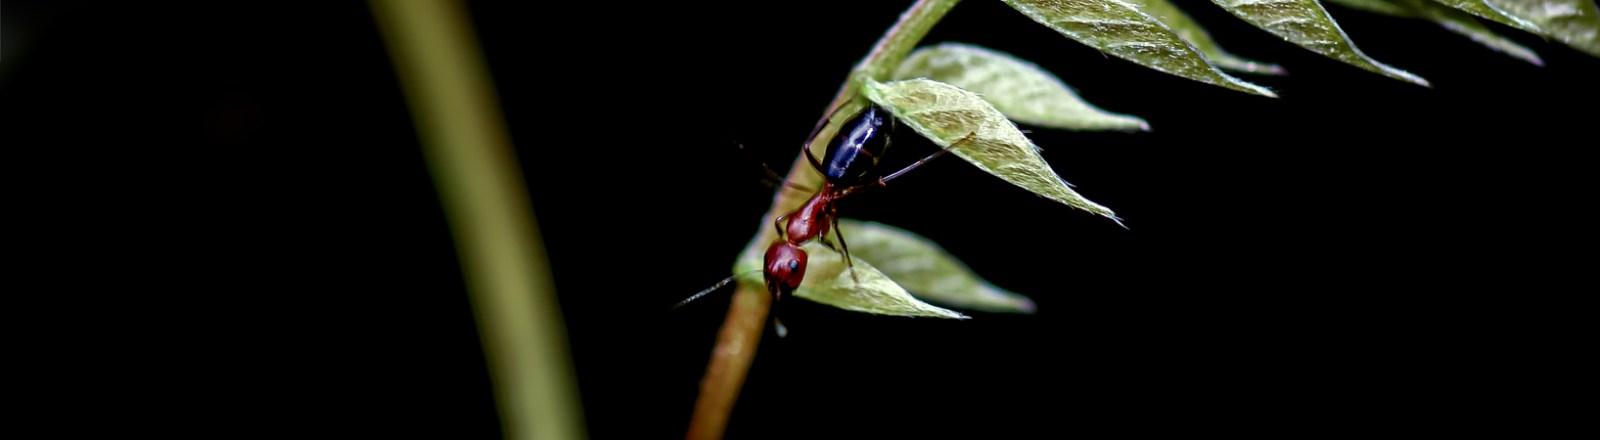 The Red and the Black, and the Red-and-Black Ant